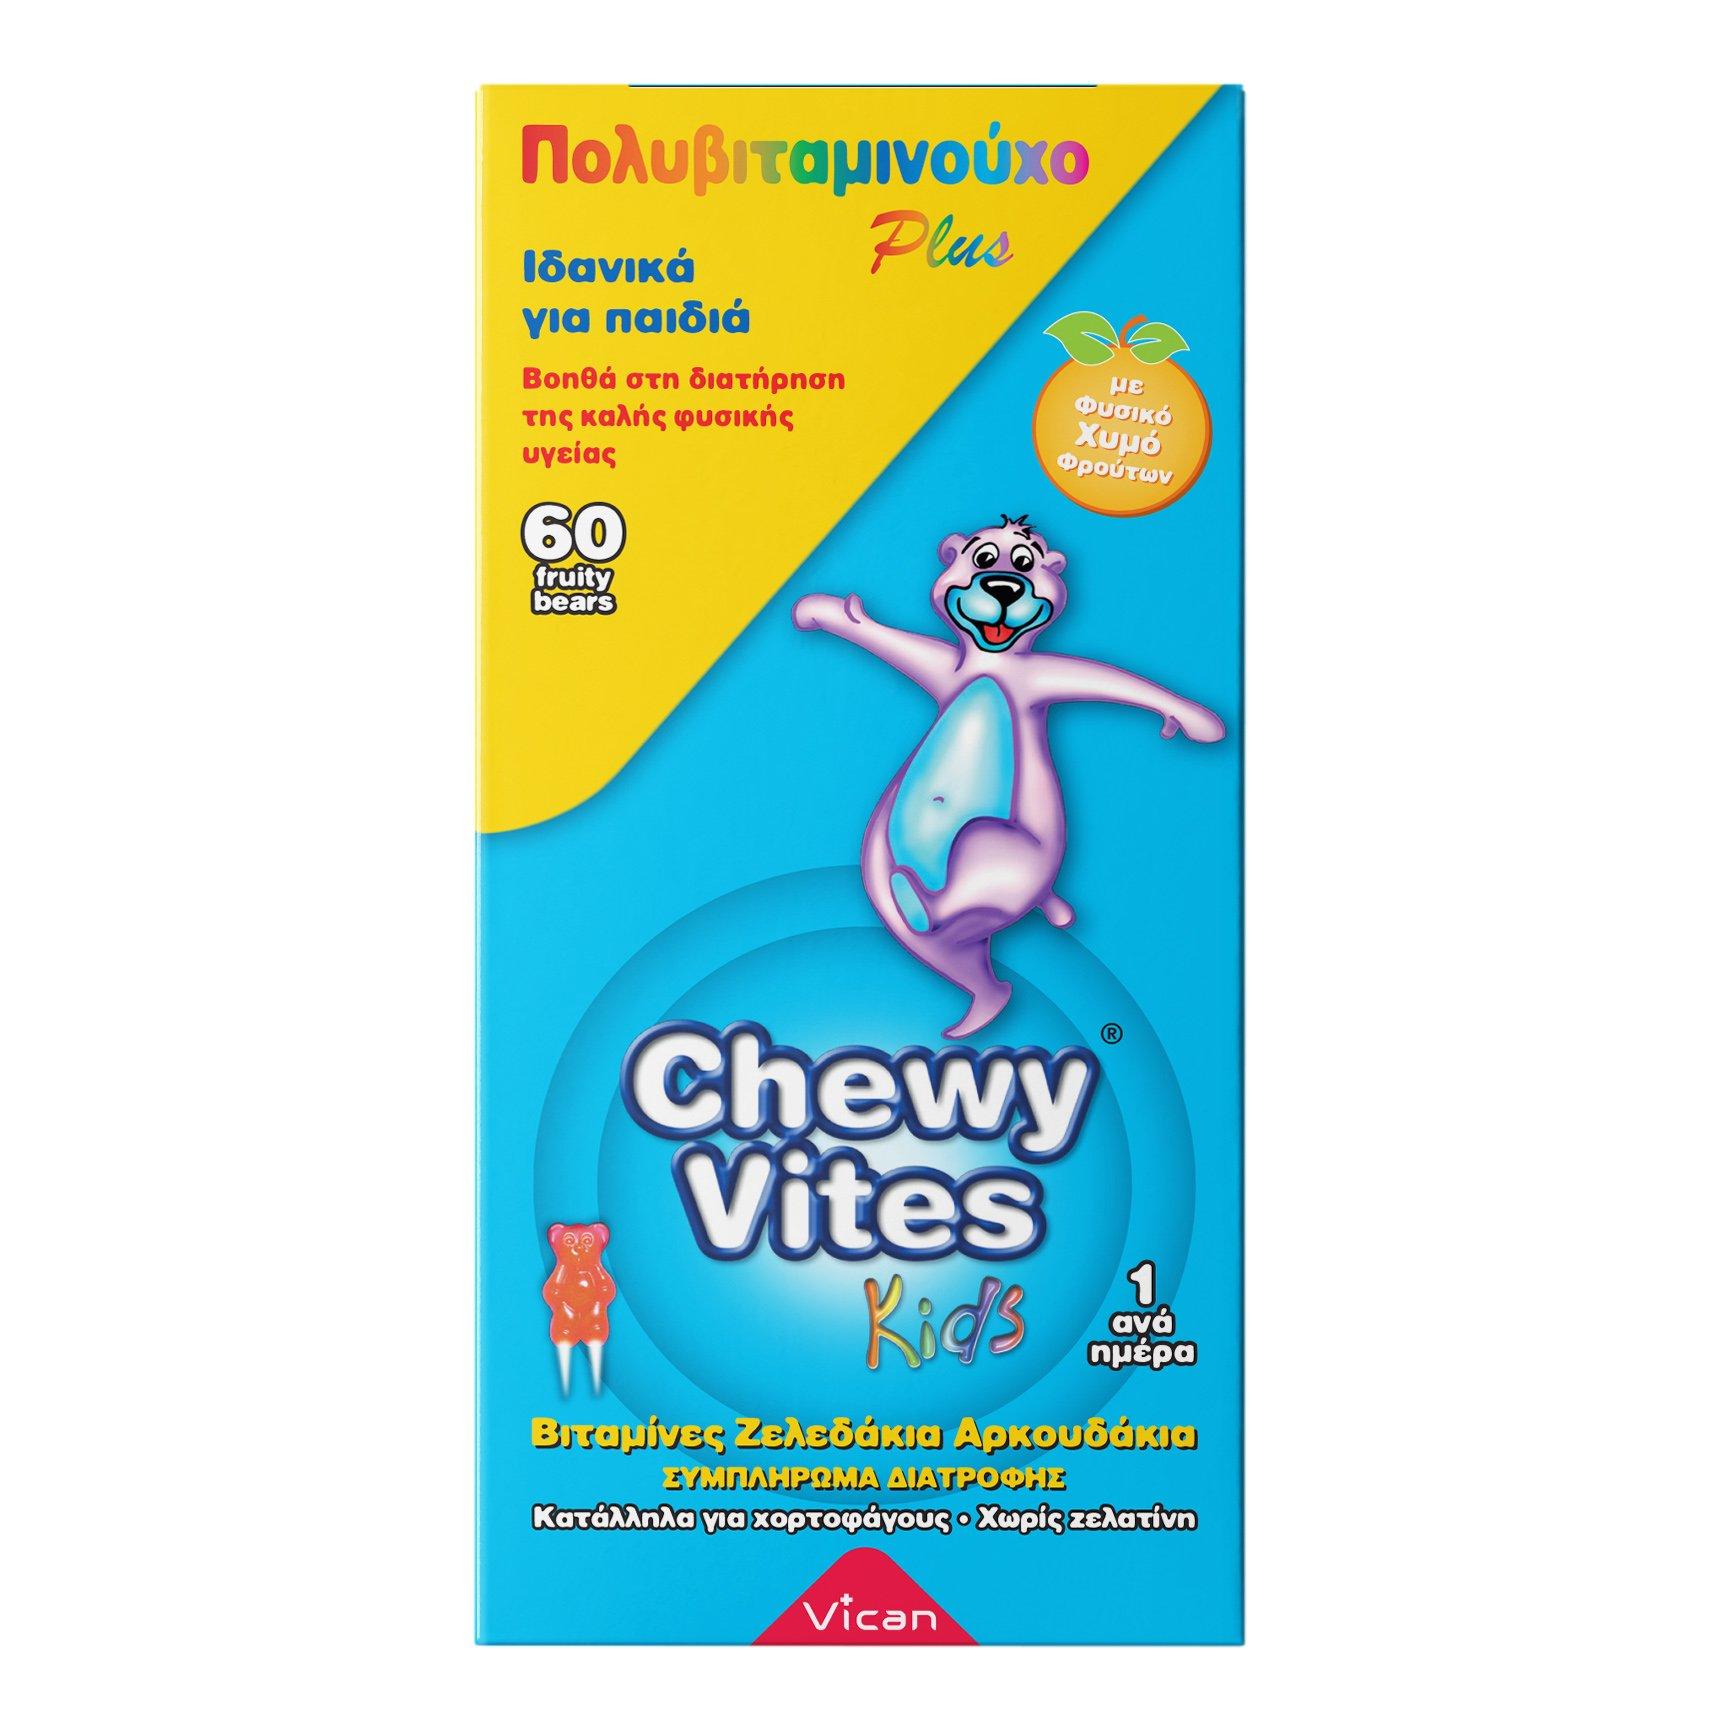 Chewy Vites Kids Multivitamin Plus Πολυβιταμίνες Ζελεδάκια για Παιδιά, 12 Βιταμίνες & Μεταλλικά Στοιχεία 60 Bears 6212M